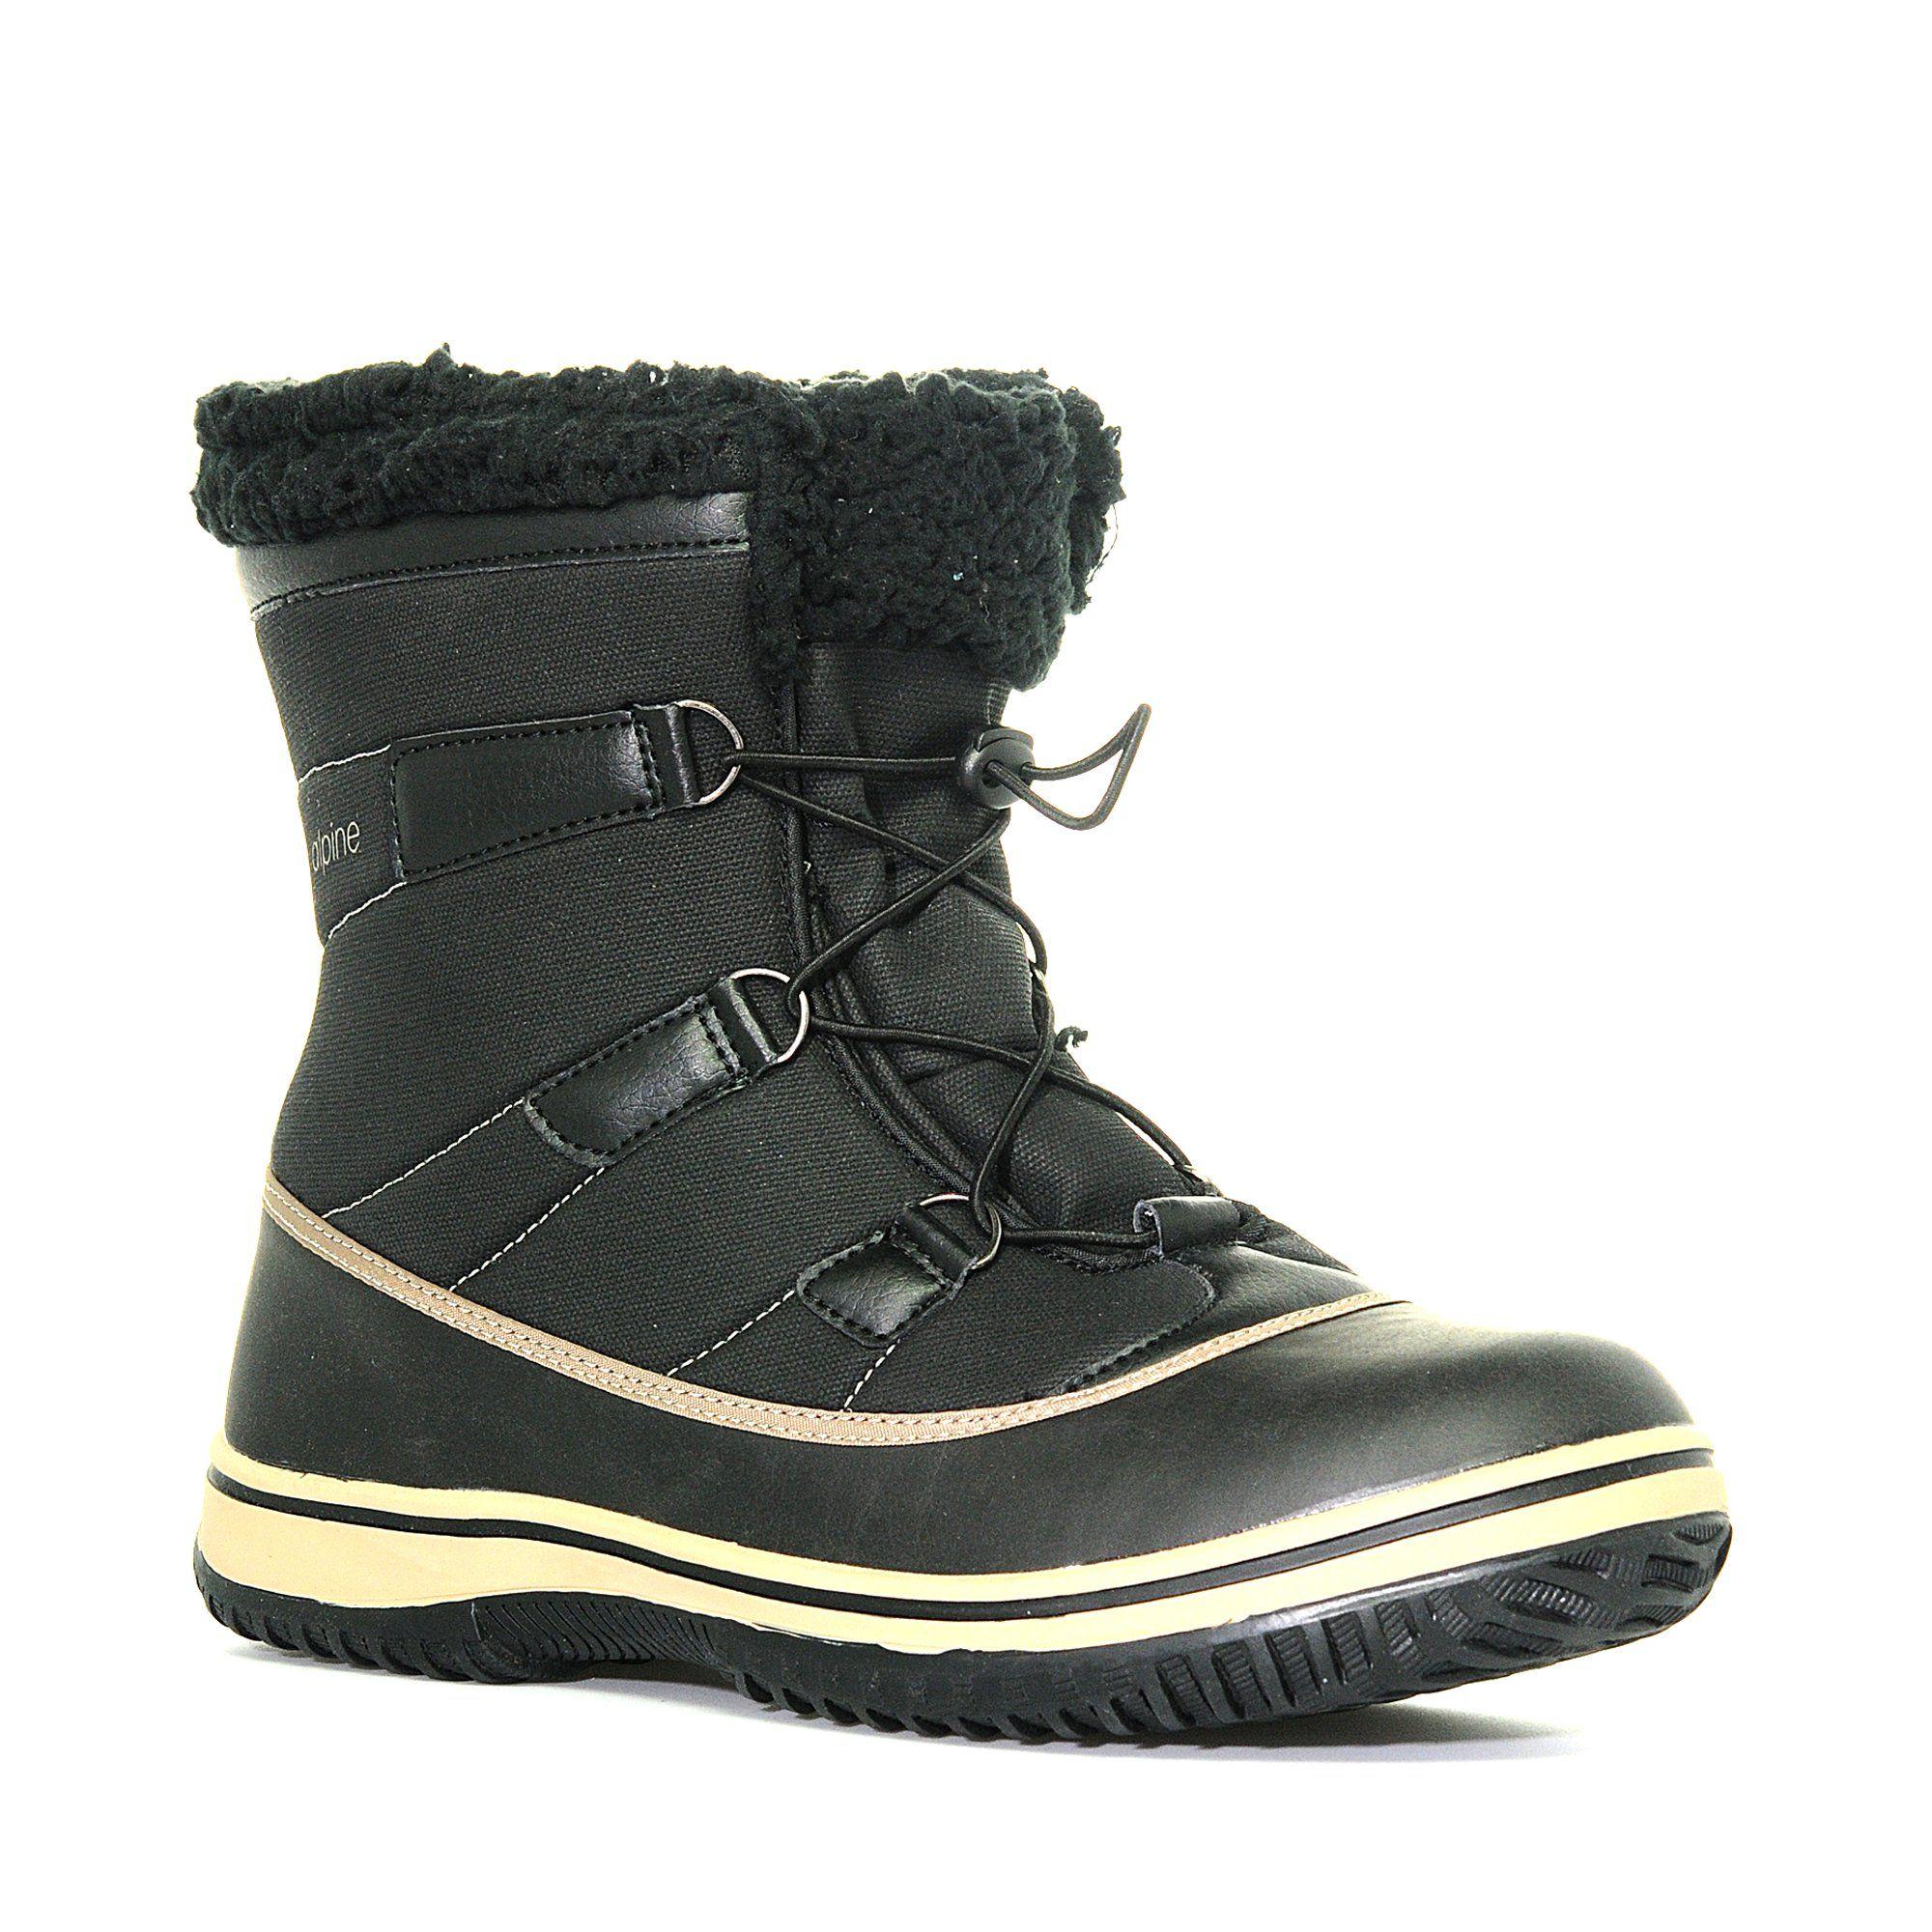 ALPINE Men's Snow Boot